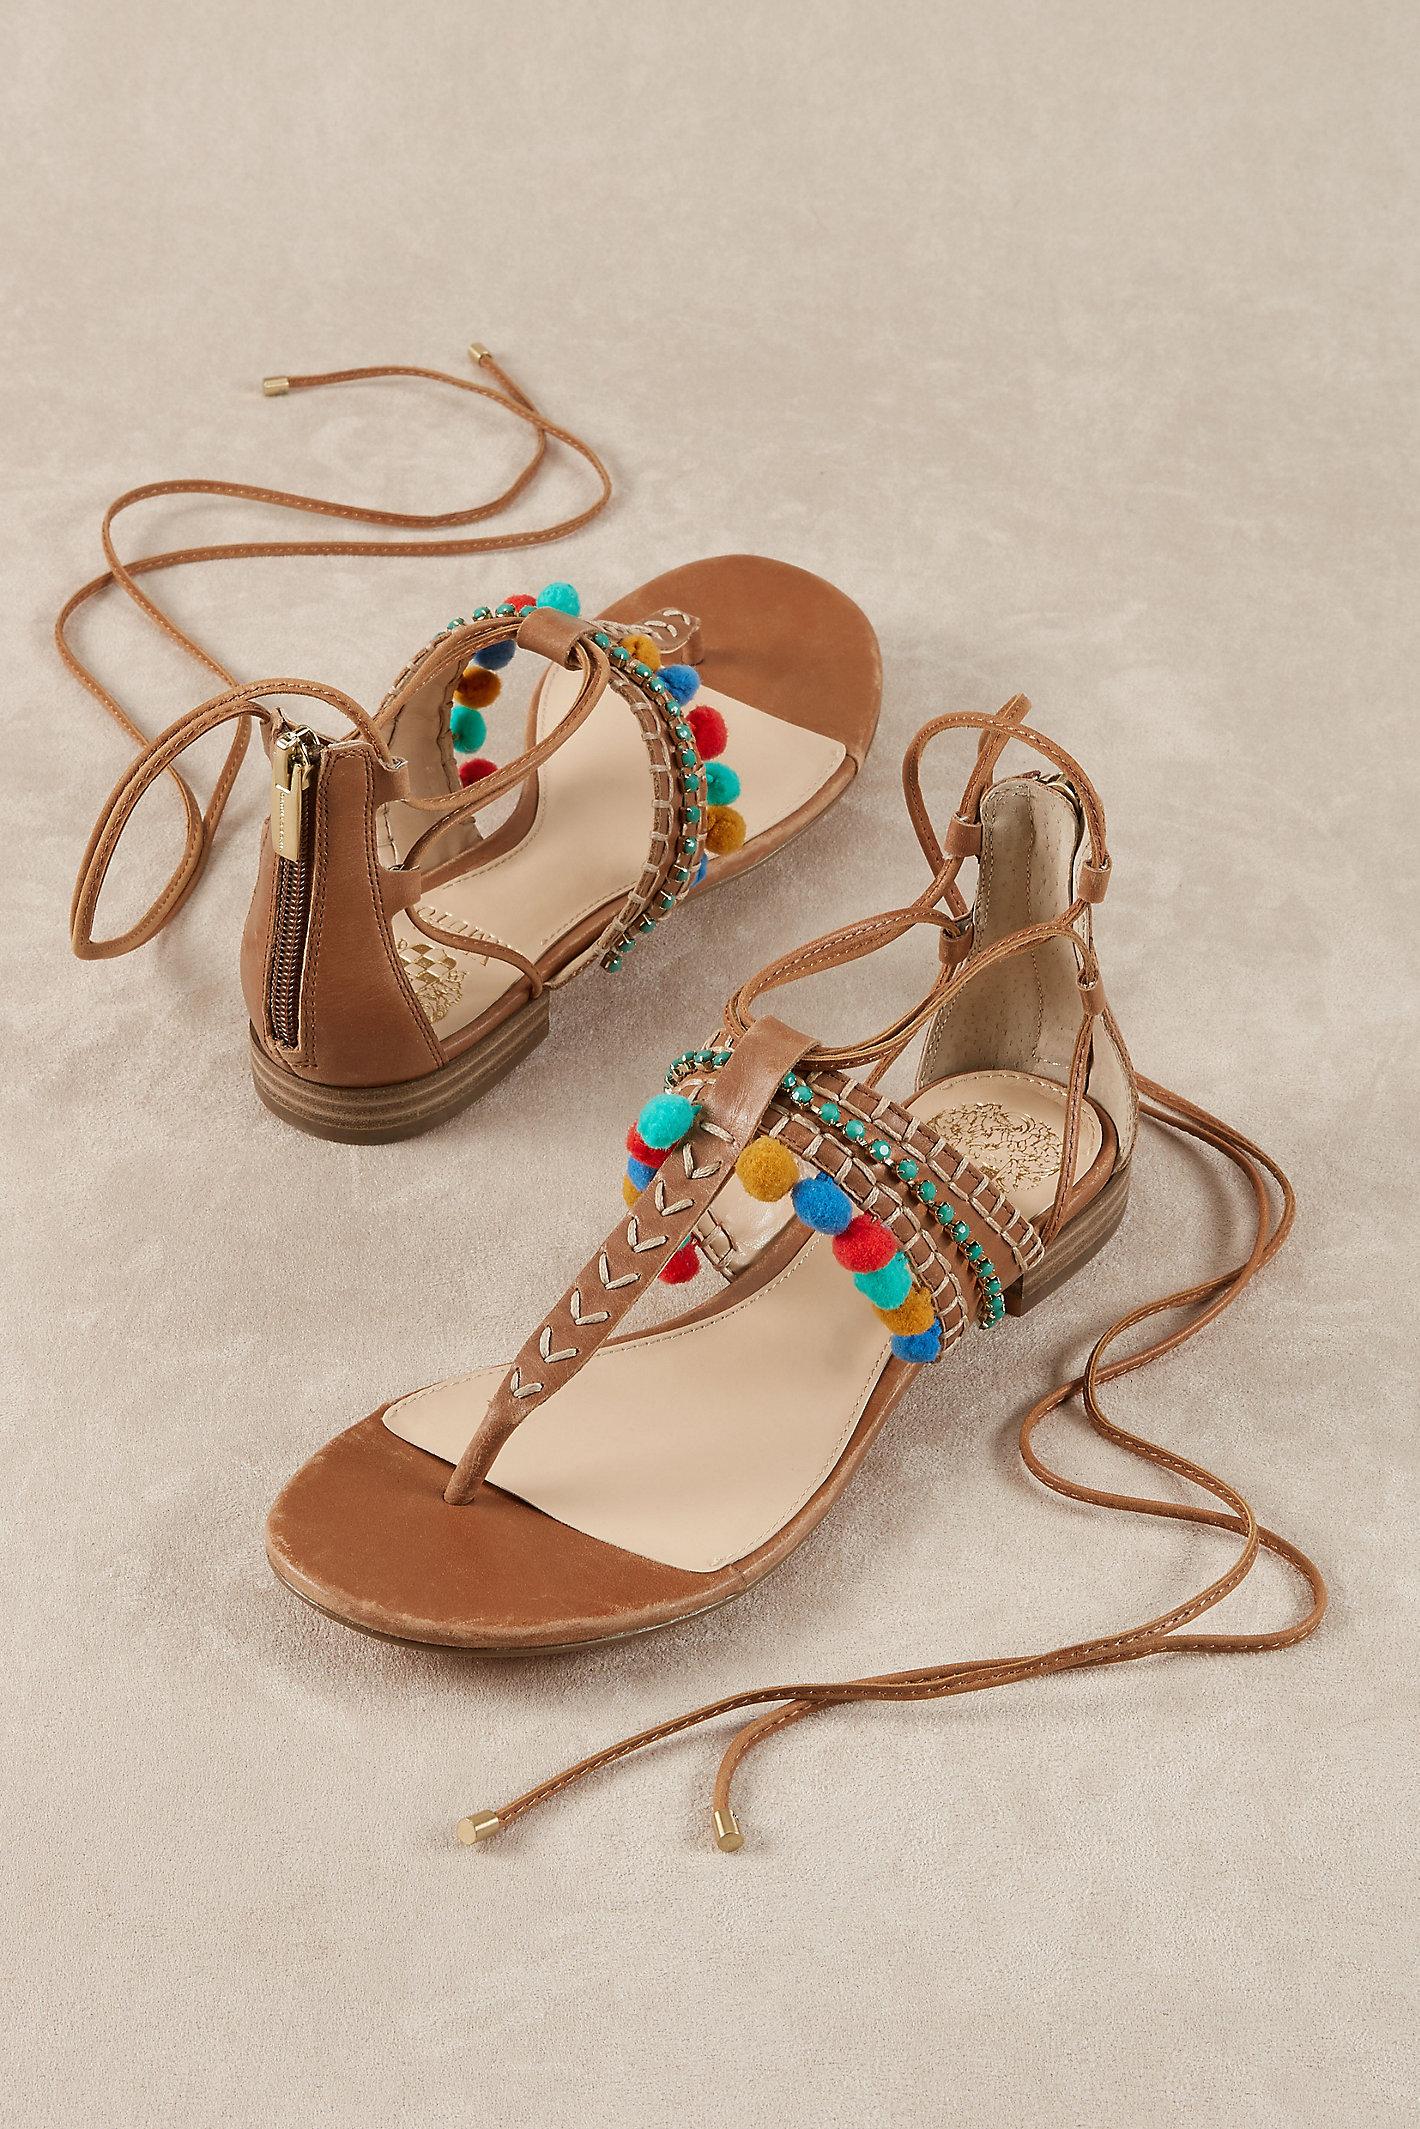 Vince Camuto Balisa Sandals